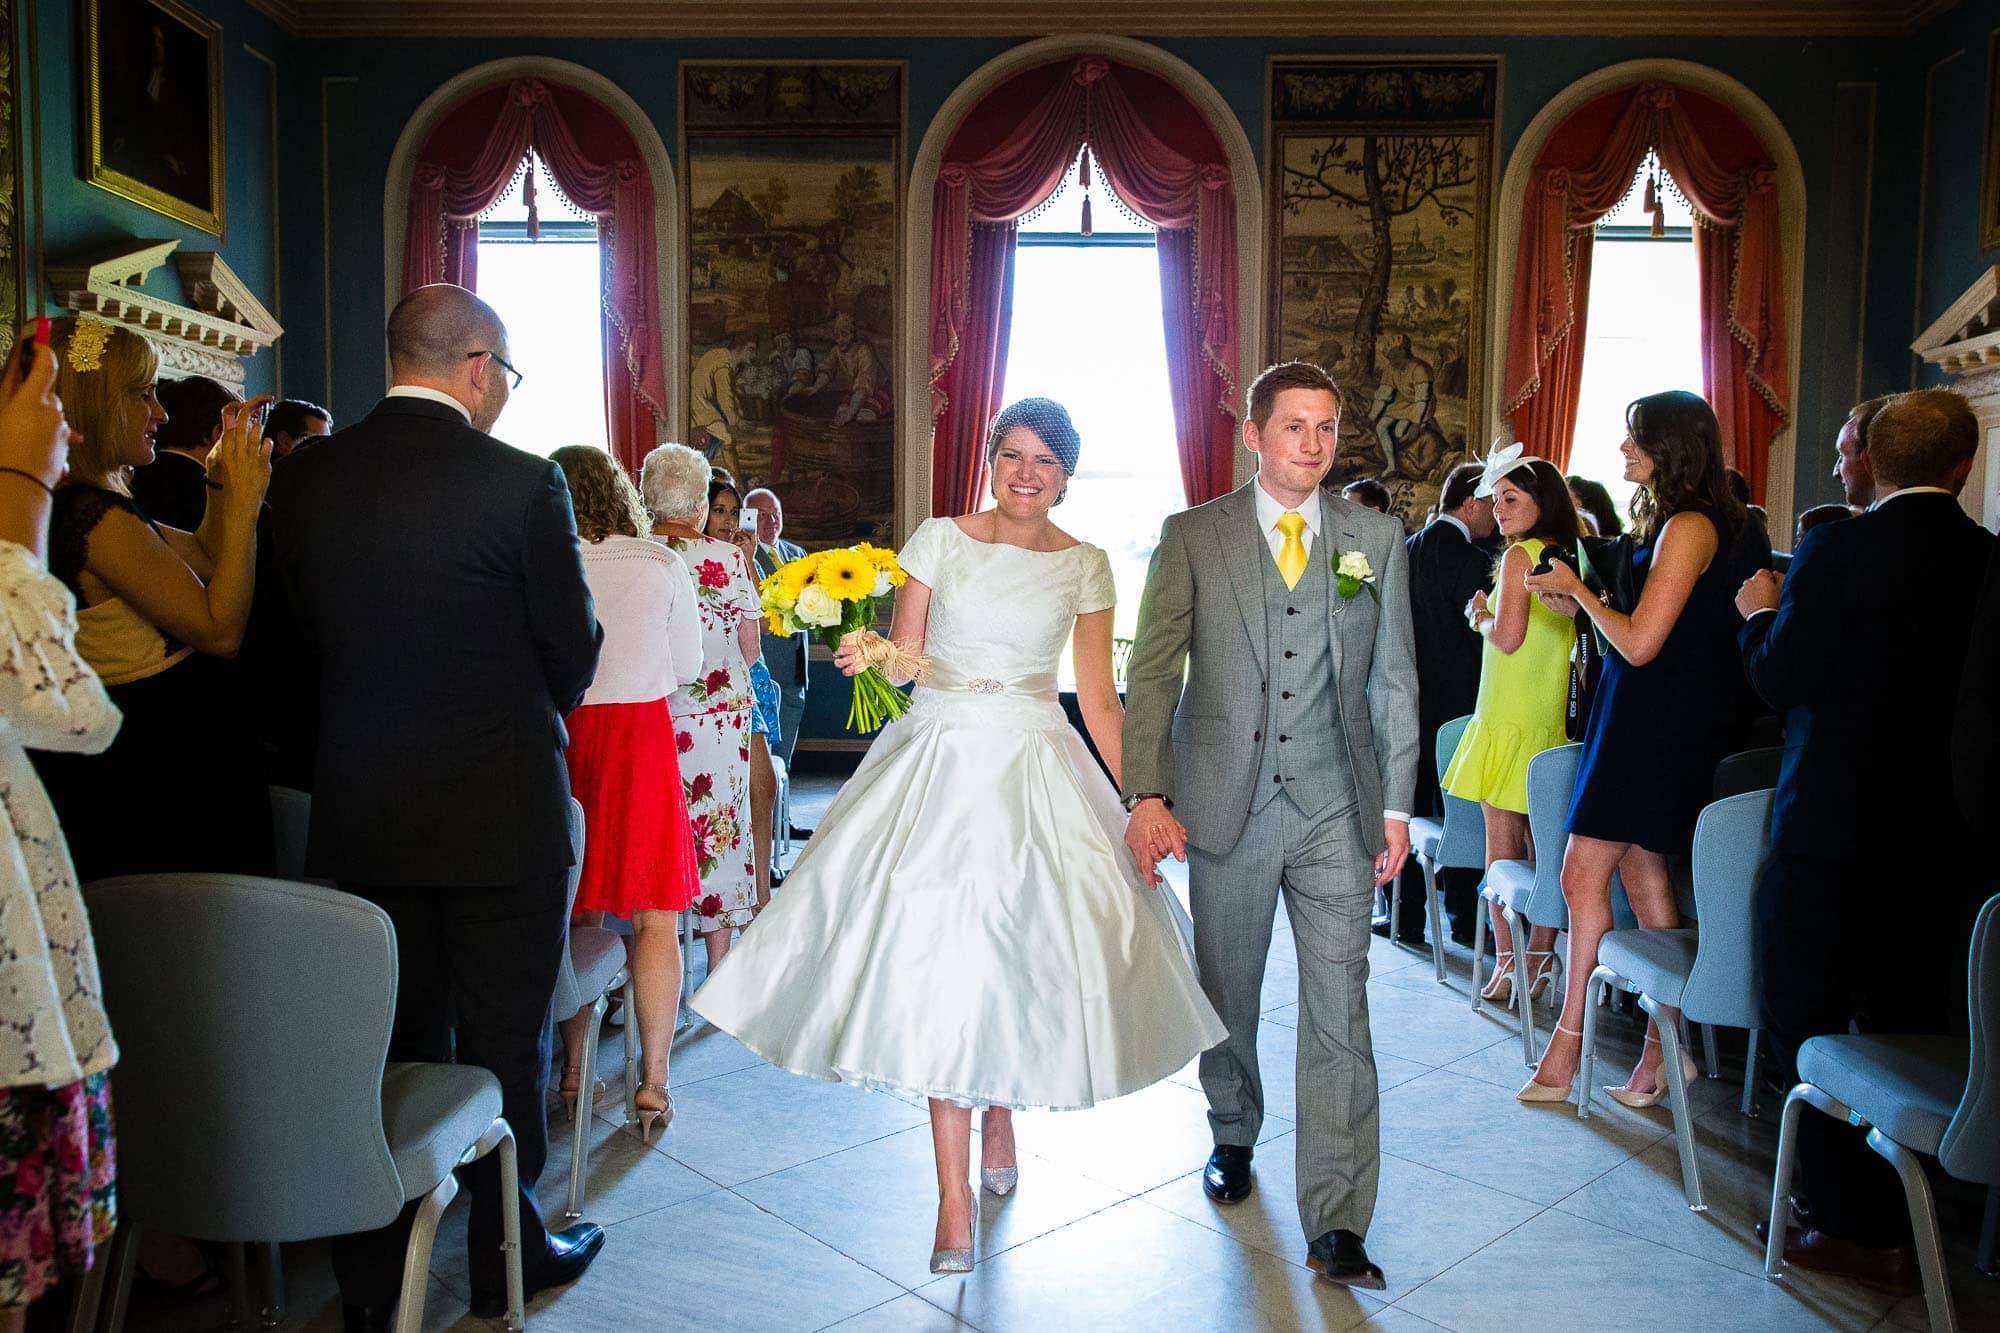 Clandon Park Wedding Photographer 54 4029